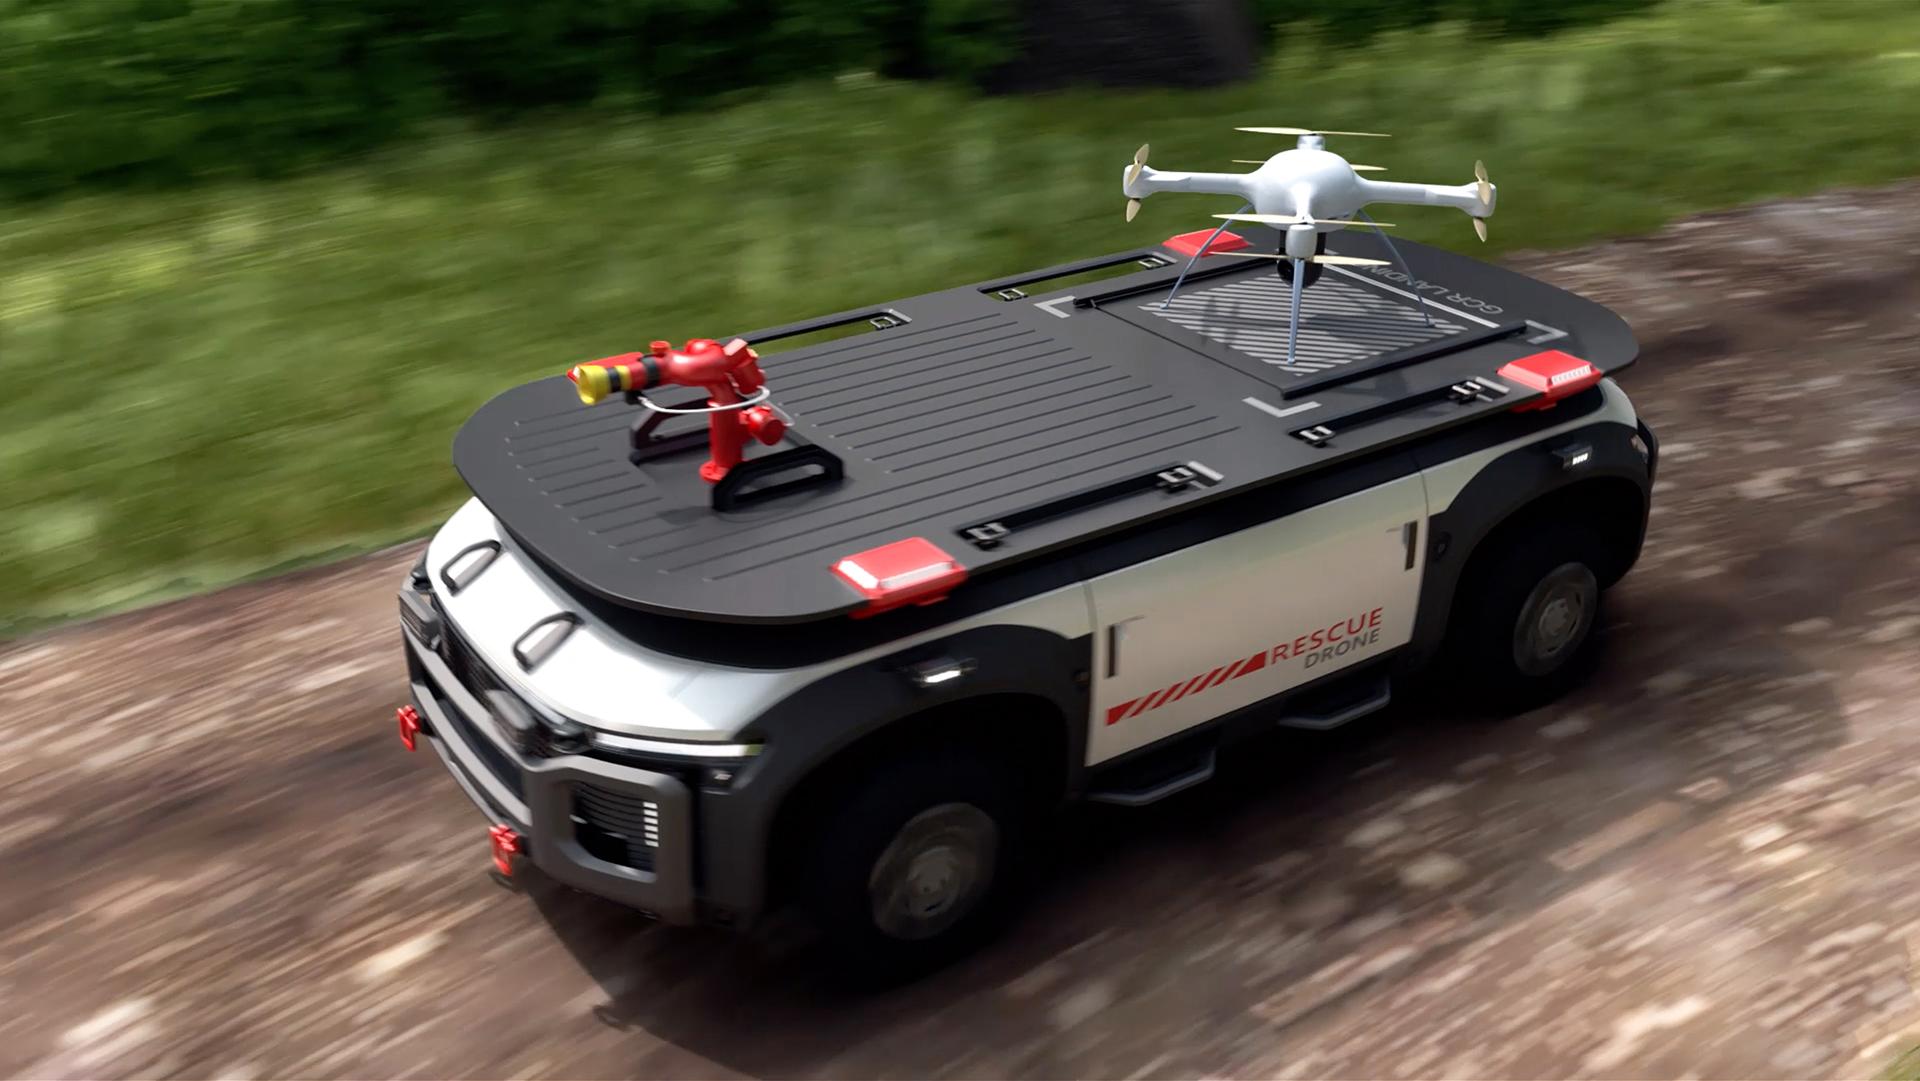 Hyundai hydrogen Rescue Drone